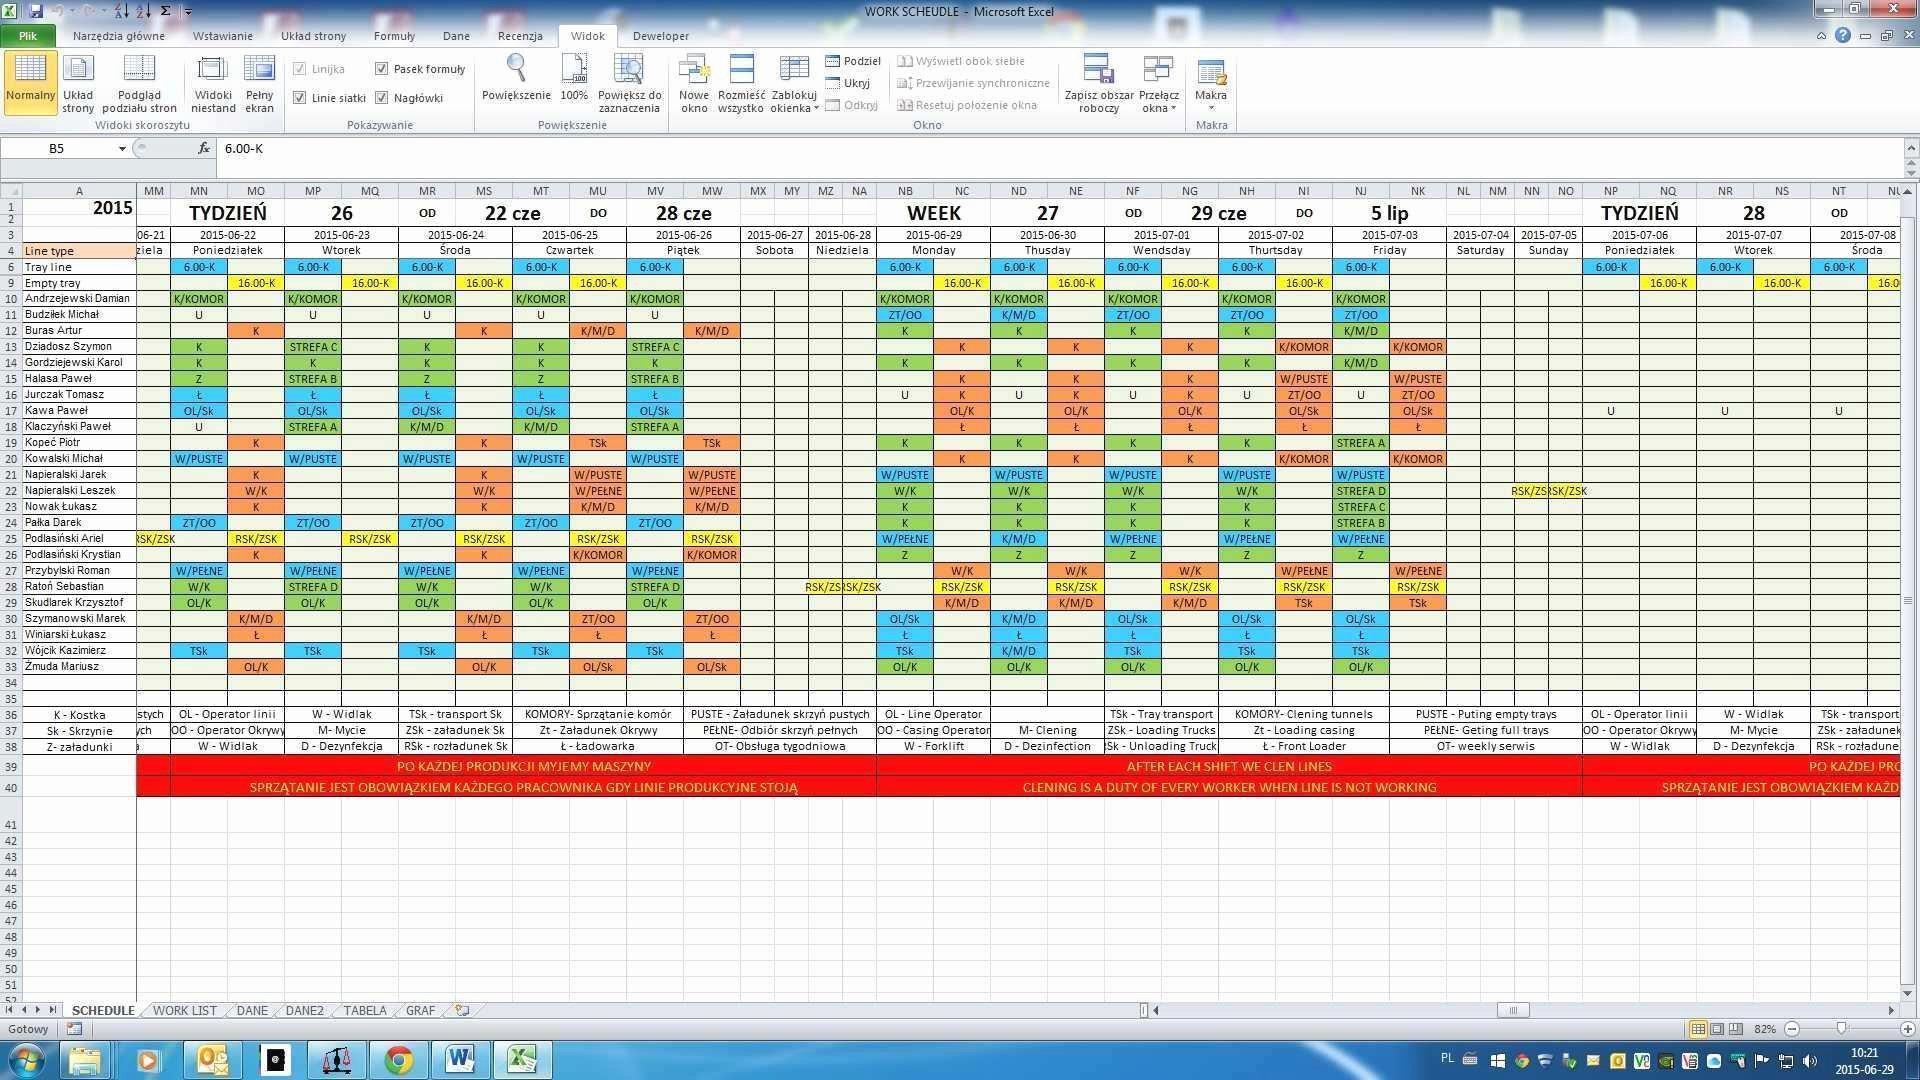 Excel Employee Shift Schedule Template Beautiful Awesome Employee Shift Schedule Excel Template Download